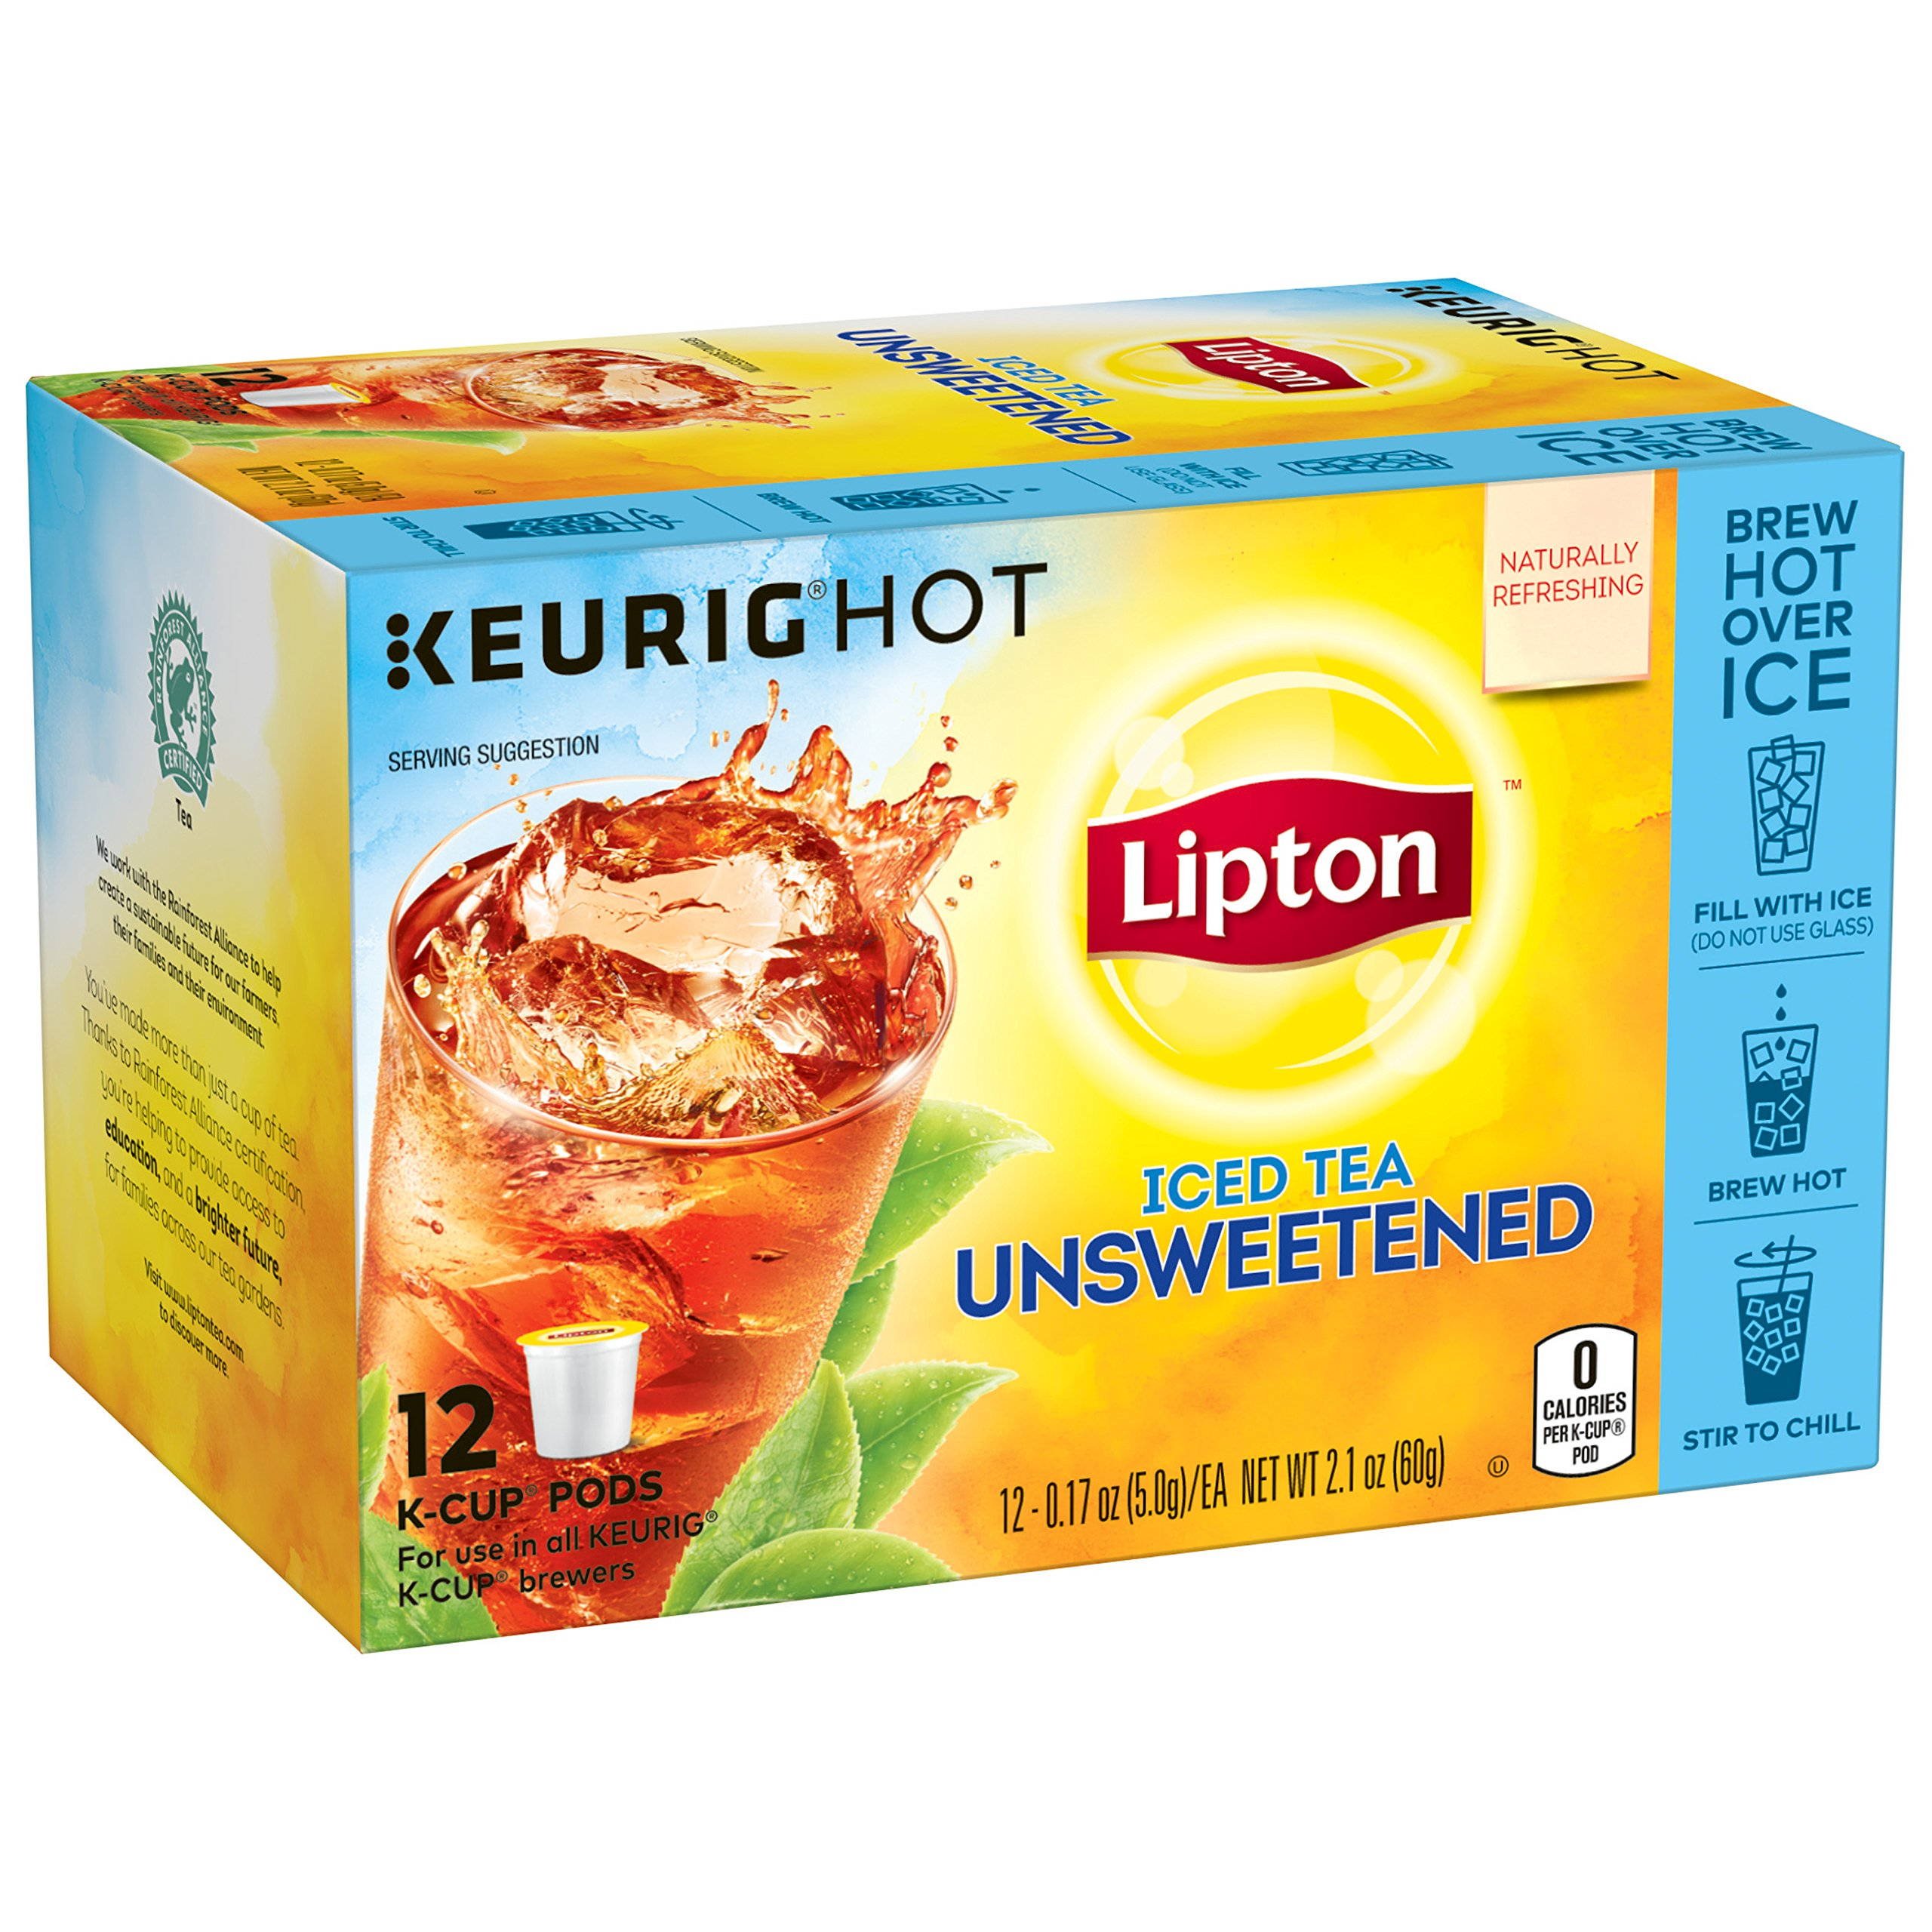 Lipton Iced Tea K-Cups, Iced Tea Unsweetened 12 ct (Pack of 6)